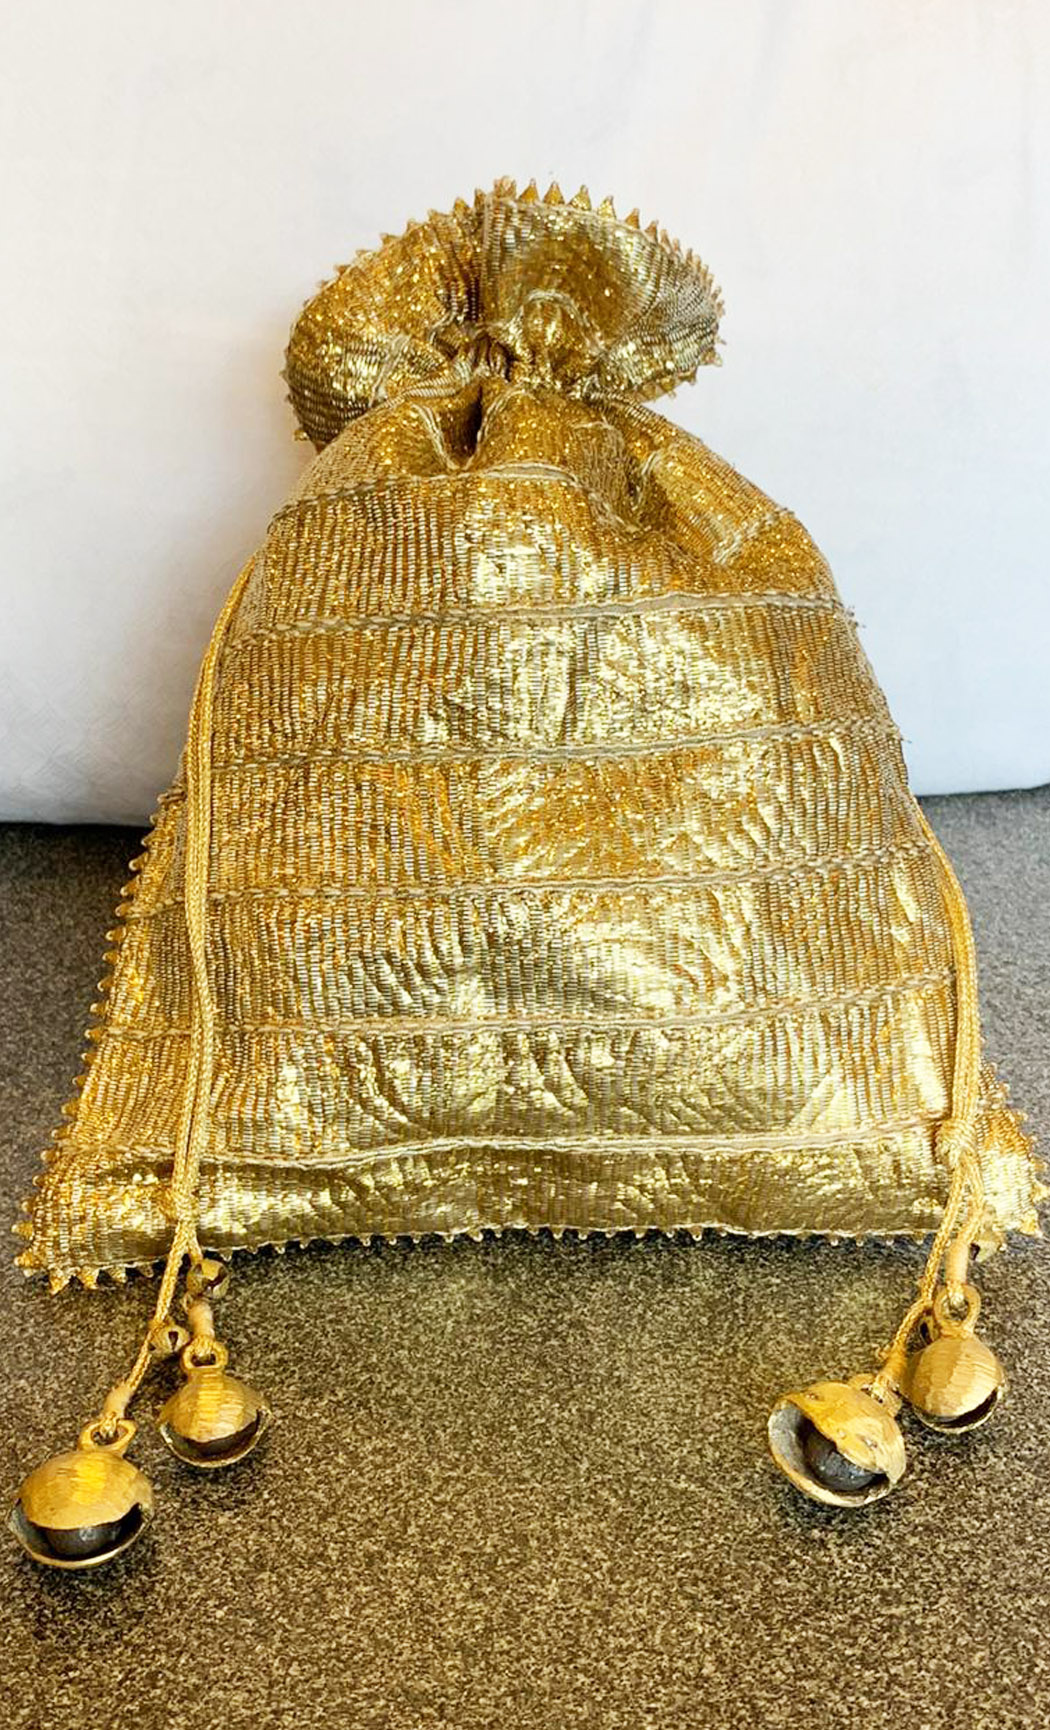 Gold Potli (Pack of 5) - Buy Online